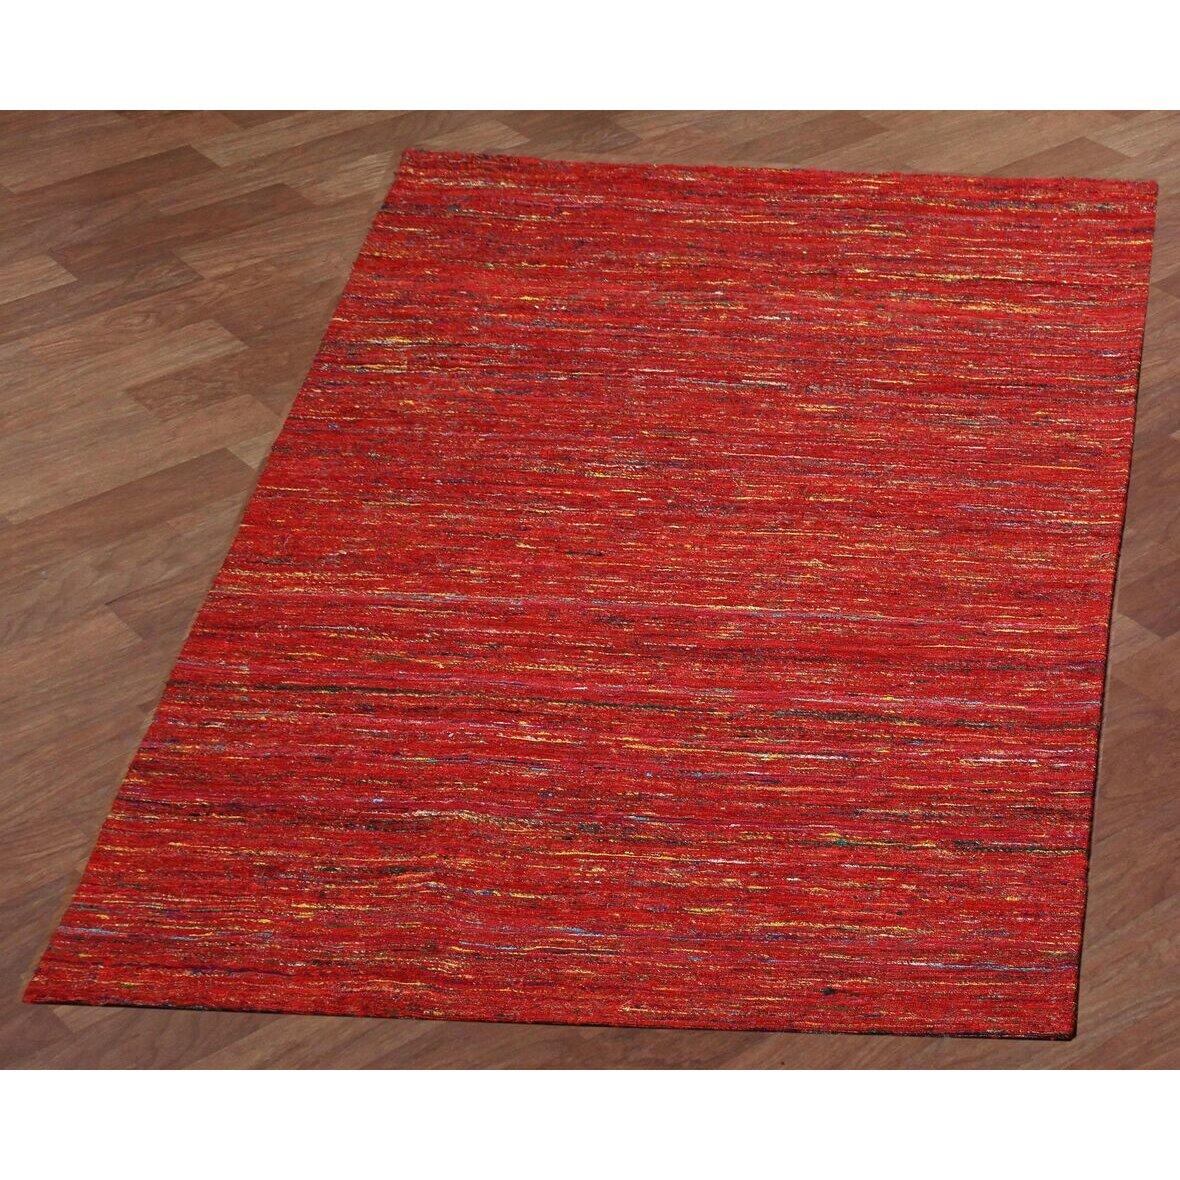 St croix sari silk handmade red area rug wayfair for Custom made area rugs